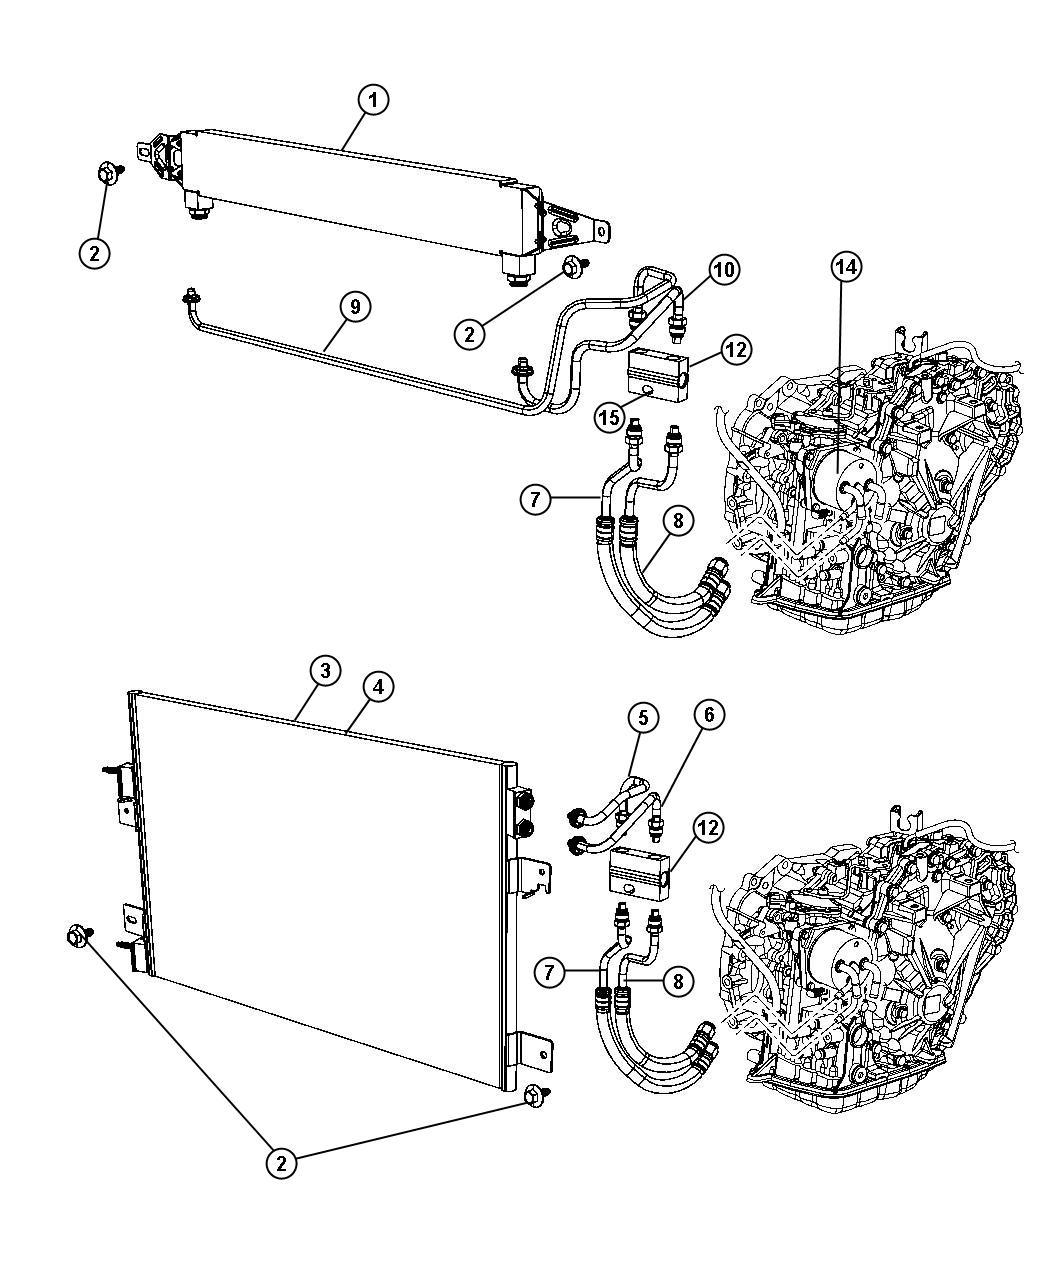 2009 Jeep Patriot Engine Diagram : 2009 jeep patriot tube transmission by pass valve ~ A.2002-acura-tl-radio.info Haus und Dekorationen